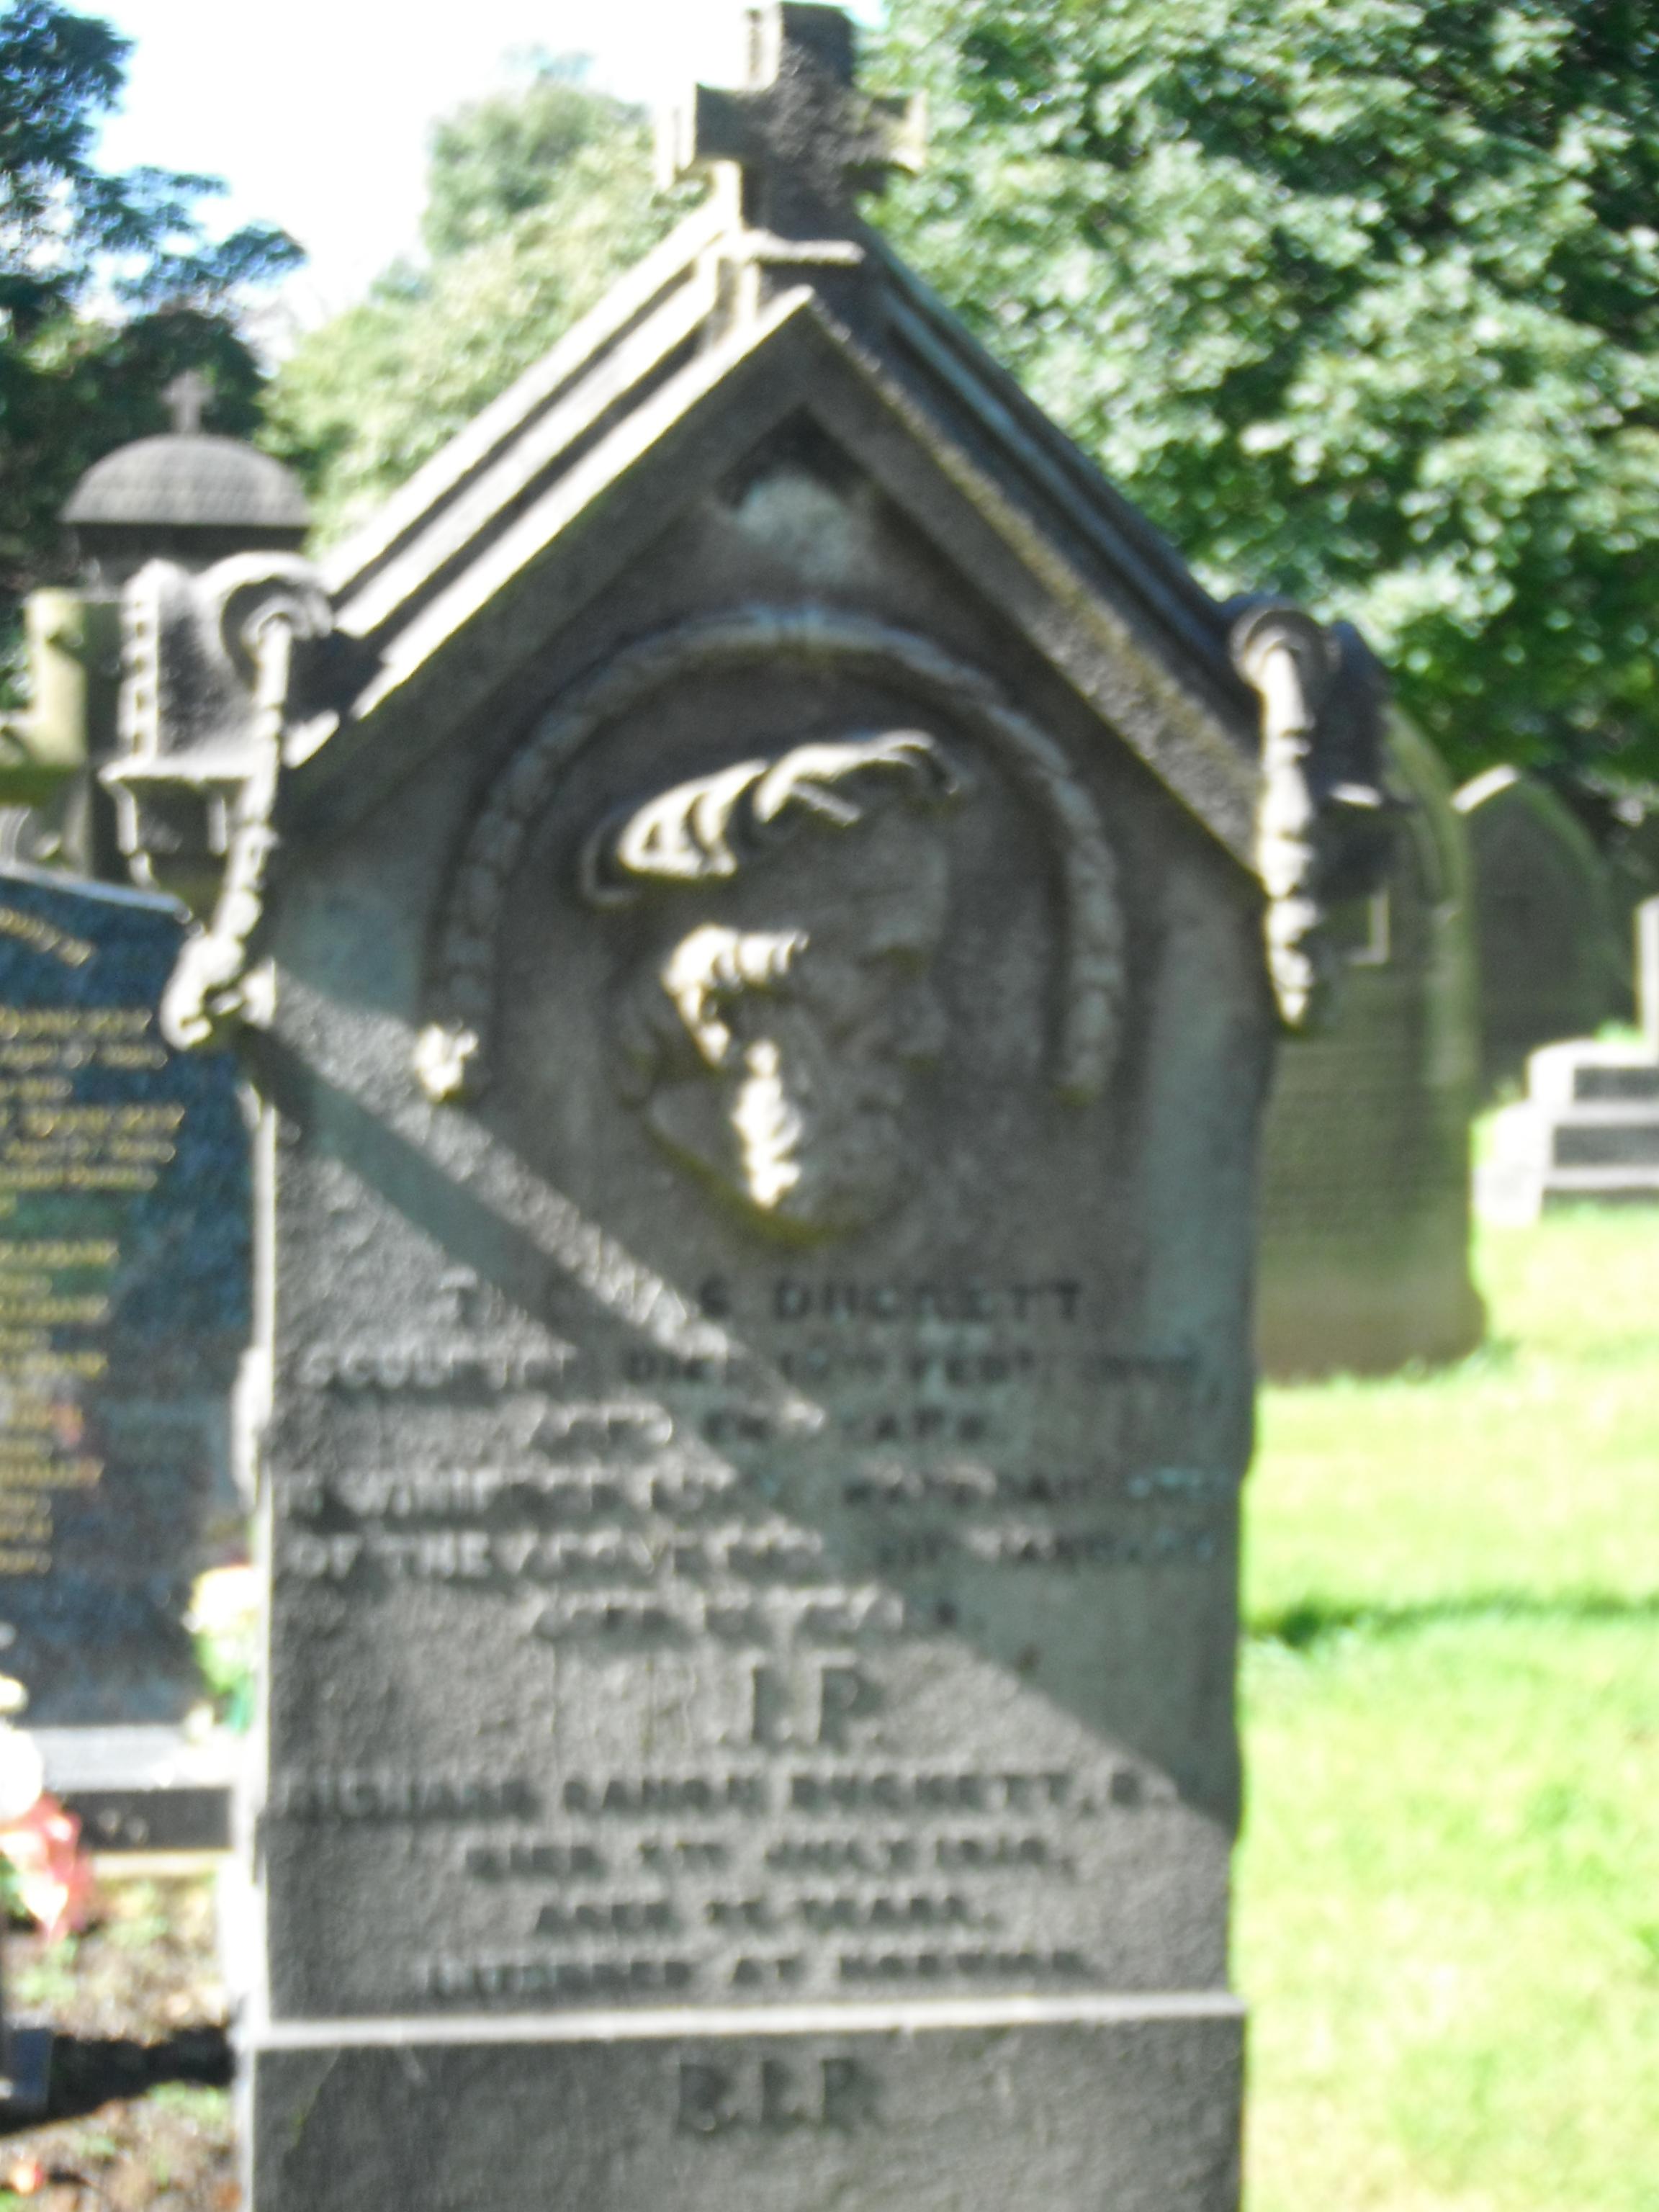 Photo taken by me - a grave in Preston Cemetery